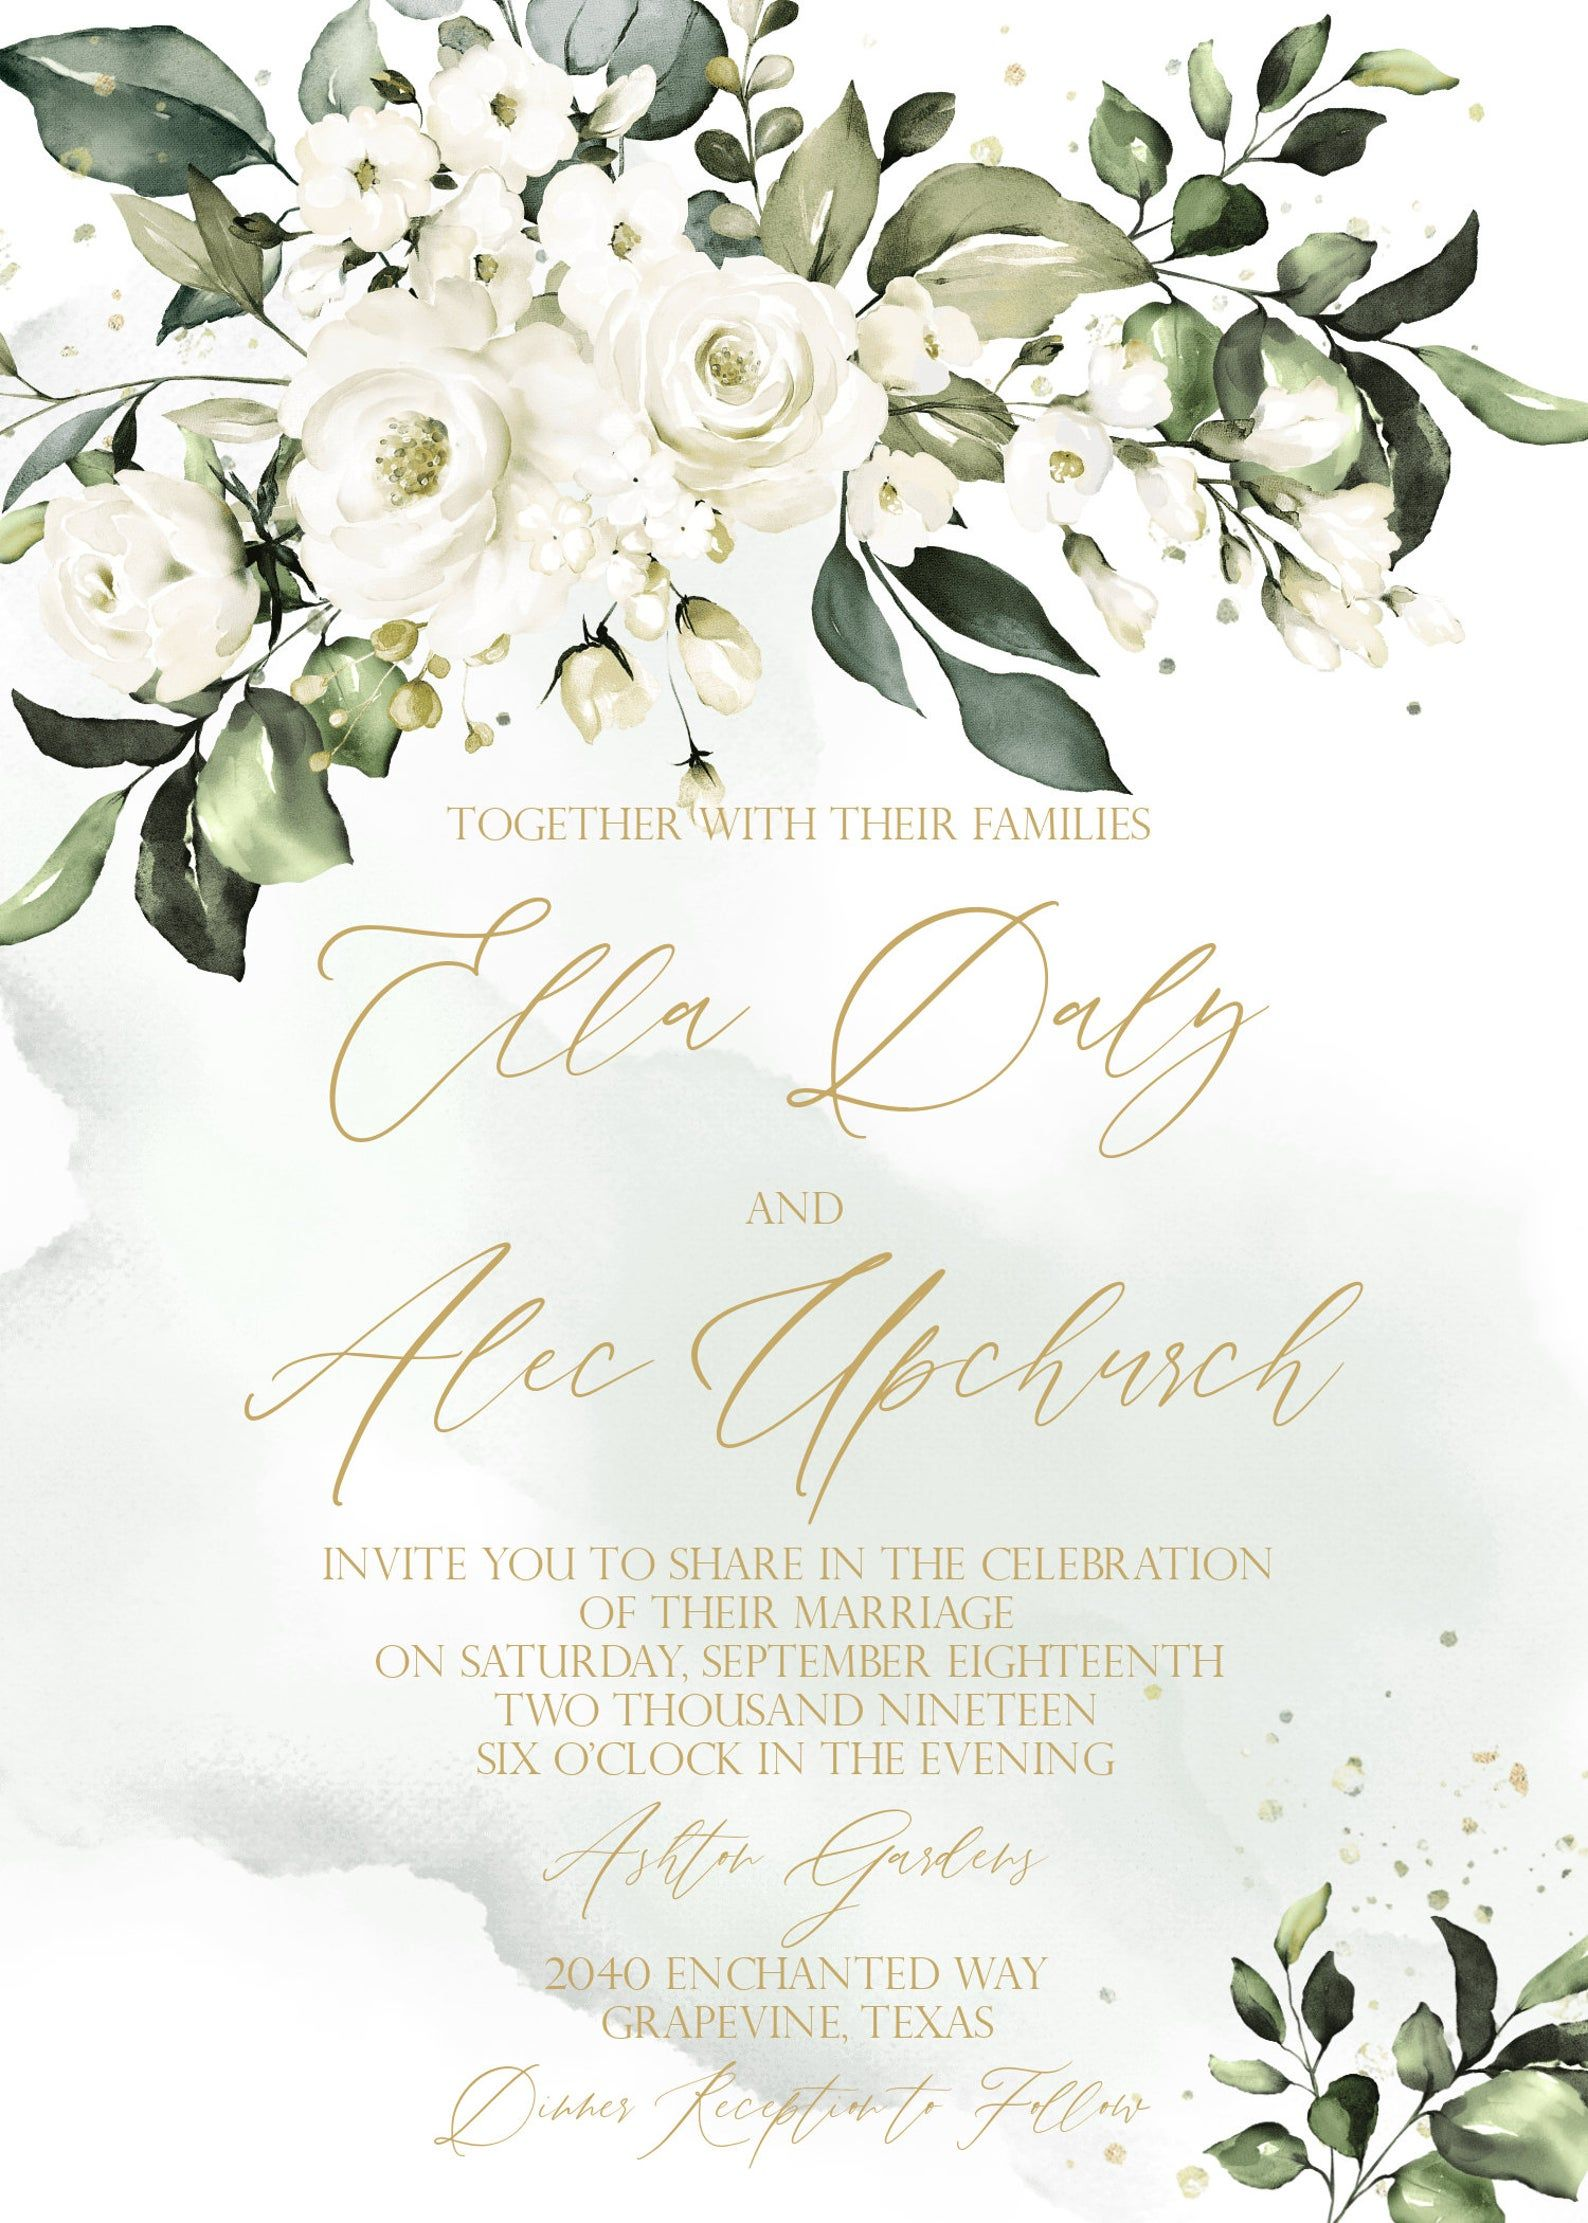 Southern Wedding Invitation Template Magnolia Wedding Etsy Southern Wedding Invitations Wedding Invitations Diy Magnolia Wedding